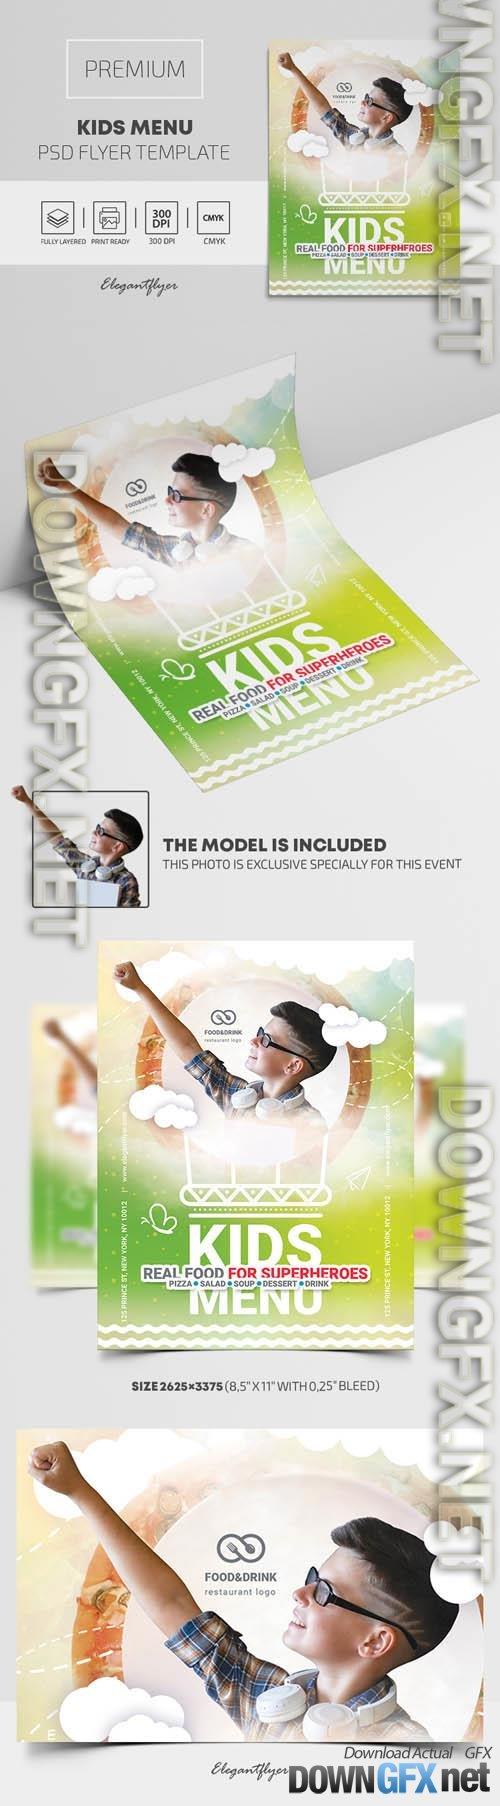 Kids Menu Delicious Healthy Premium PSD Flyer Template